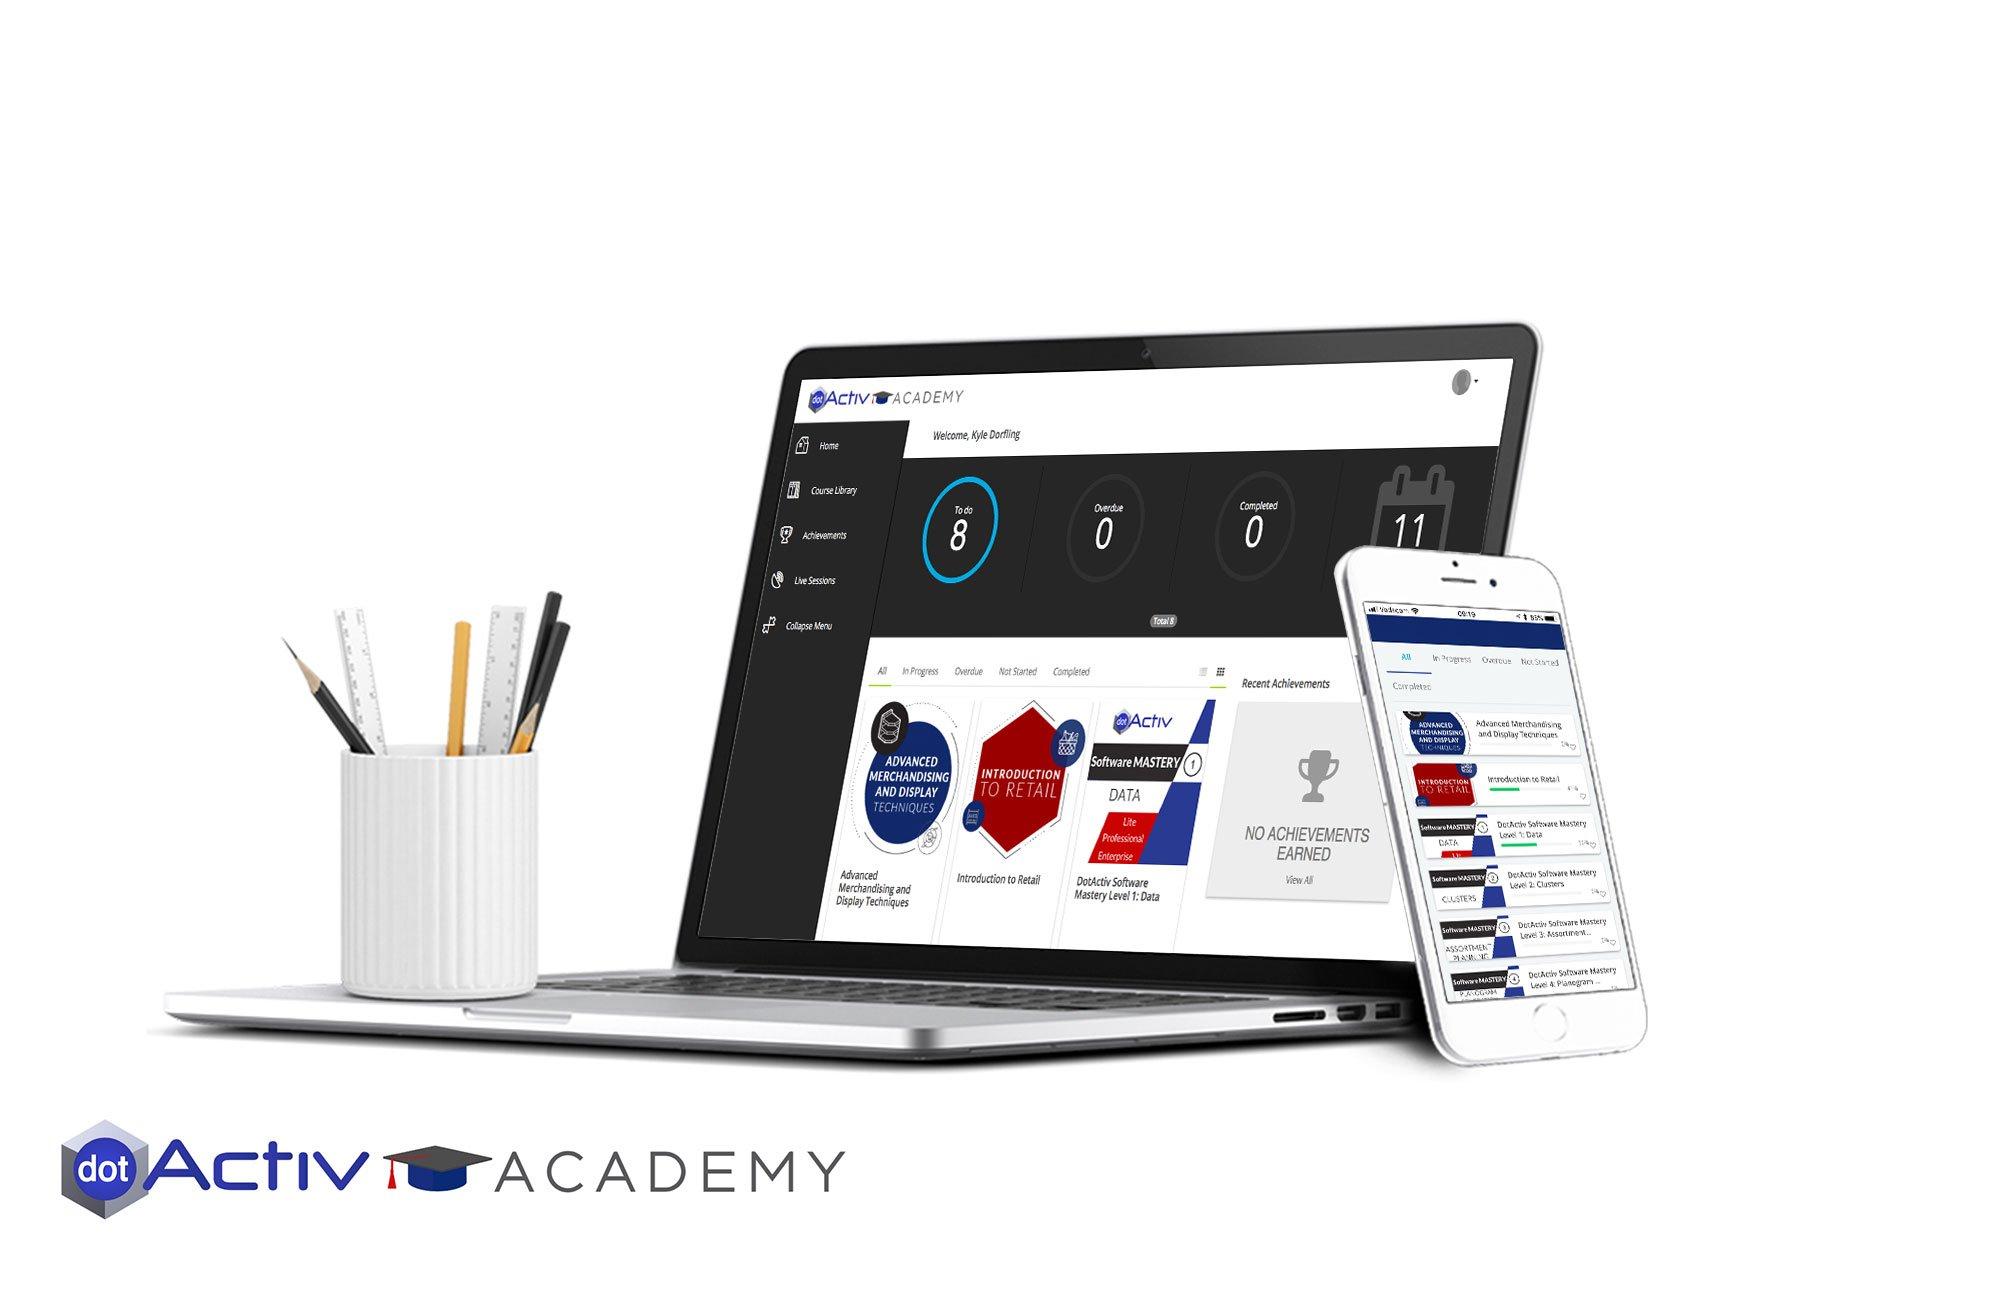 Dotactiv-Academy.jpg